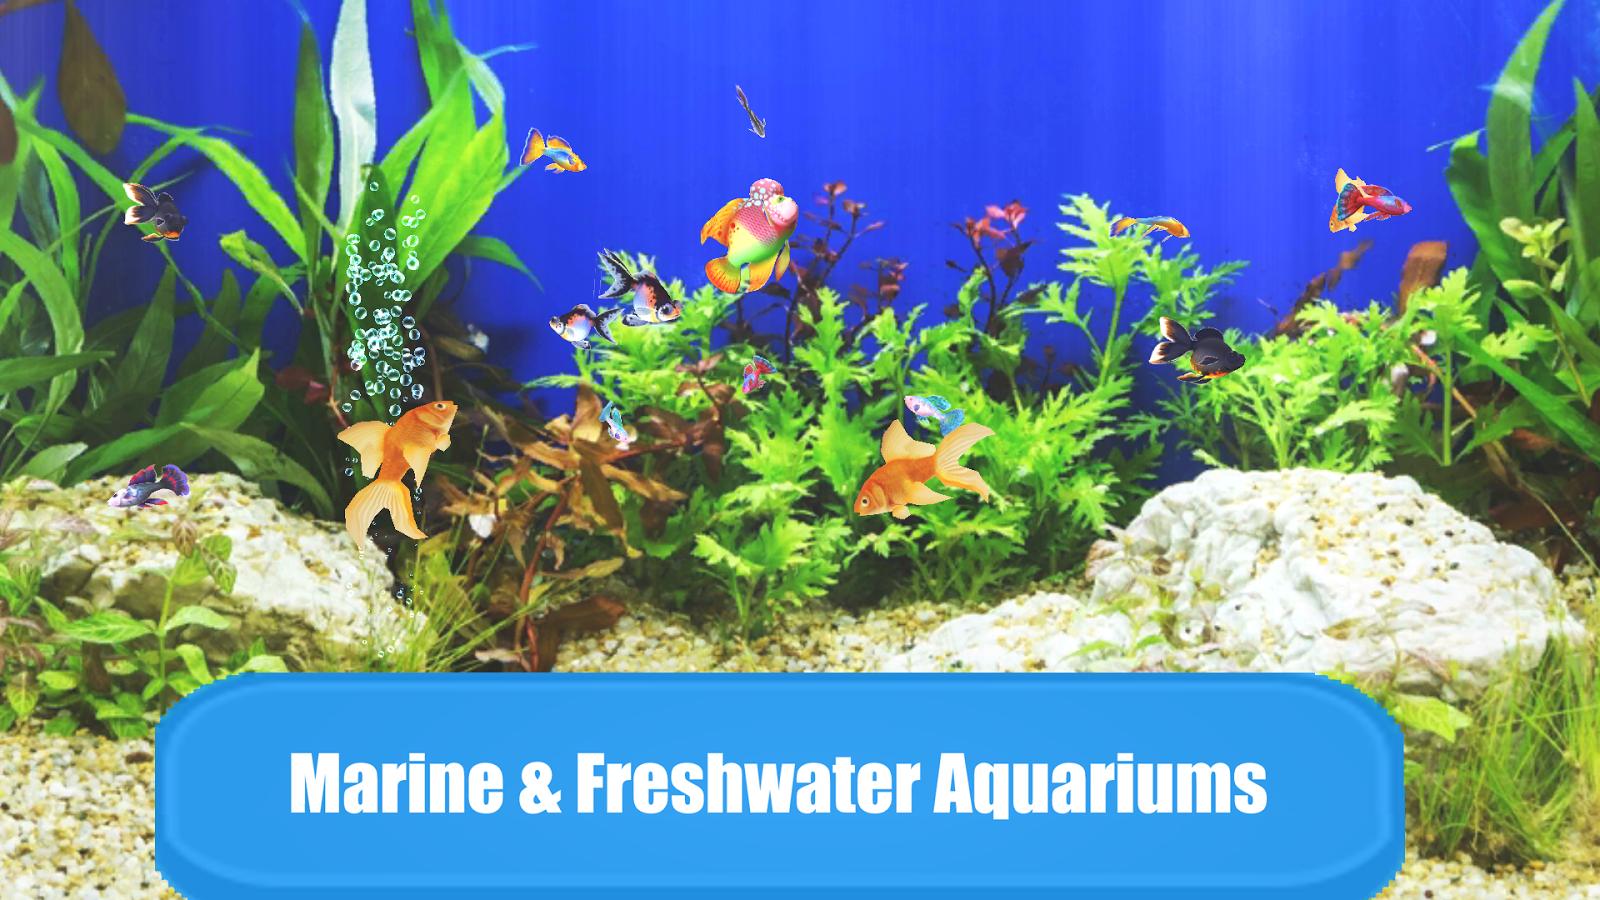 Freshwater aquarium fish compatibility chart - Aquarium Sim Screenshot